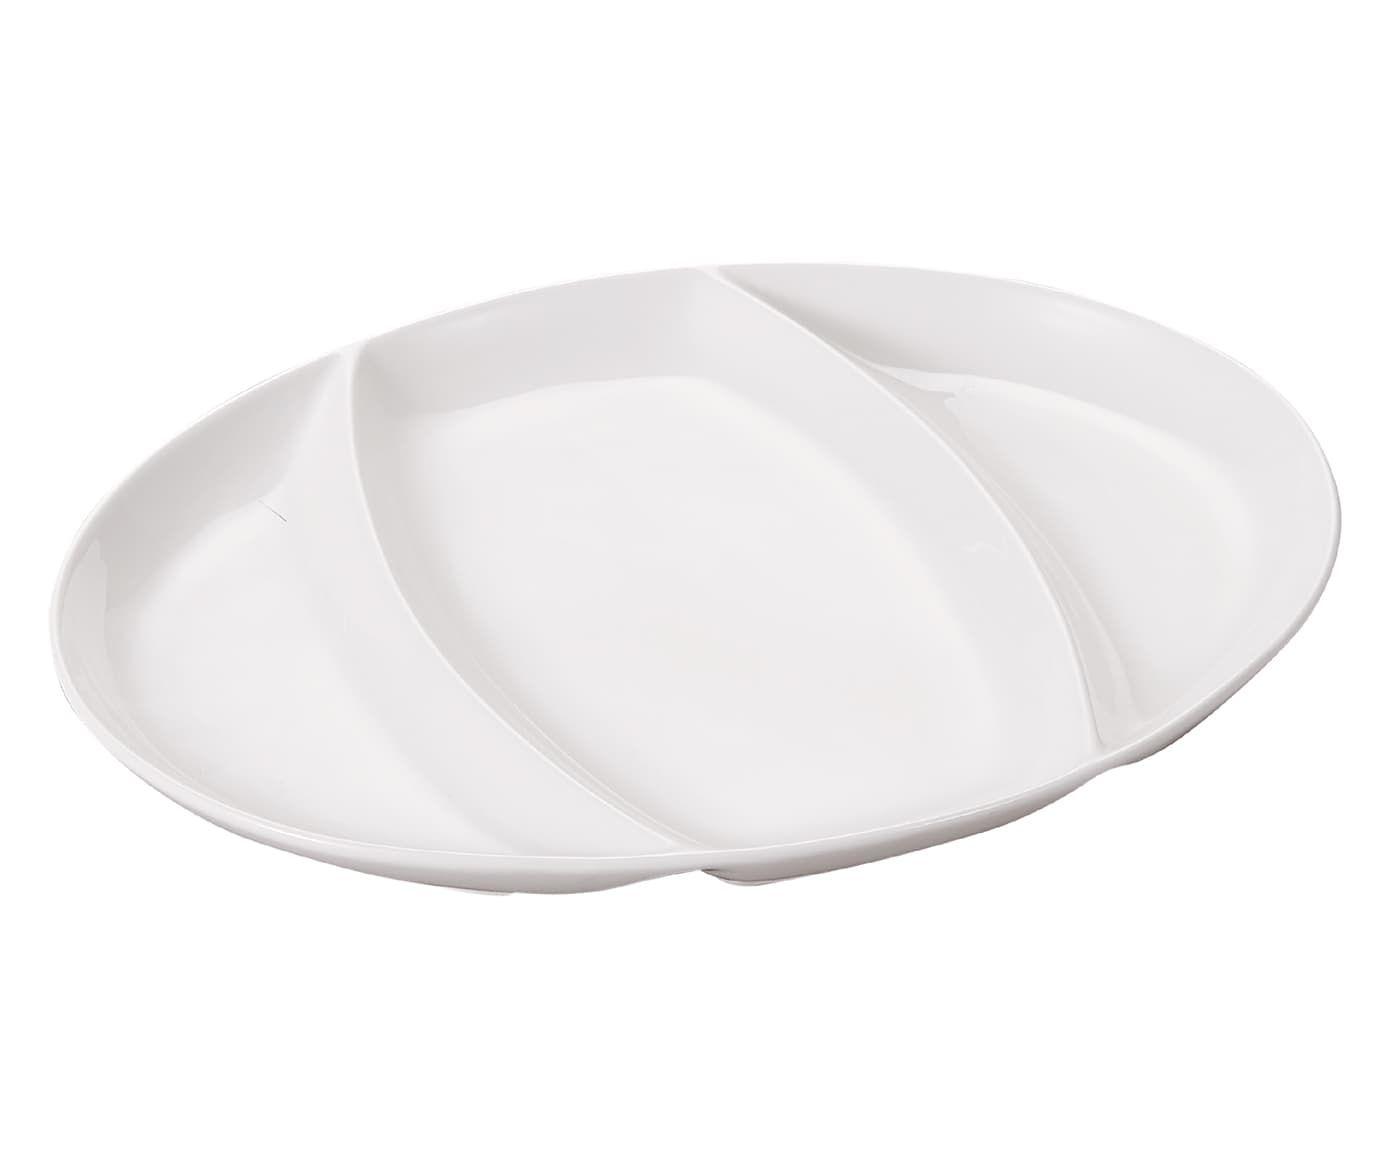 Petisqueira em Porcelana Aimable Branca - 27,8X2,4X20,6cm | Westwing.com.br